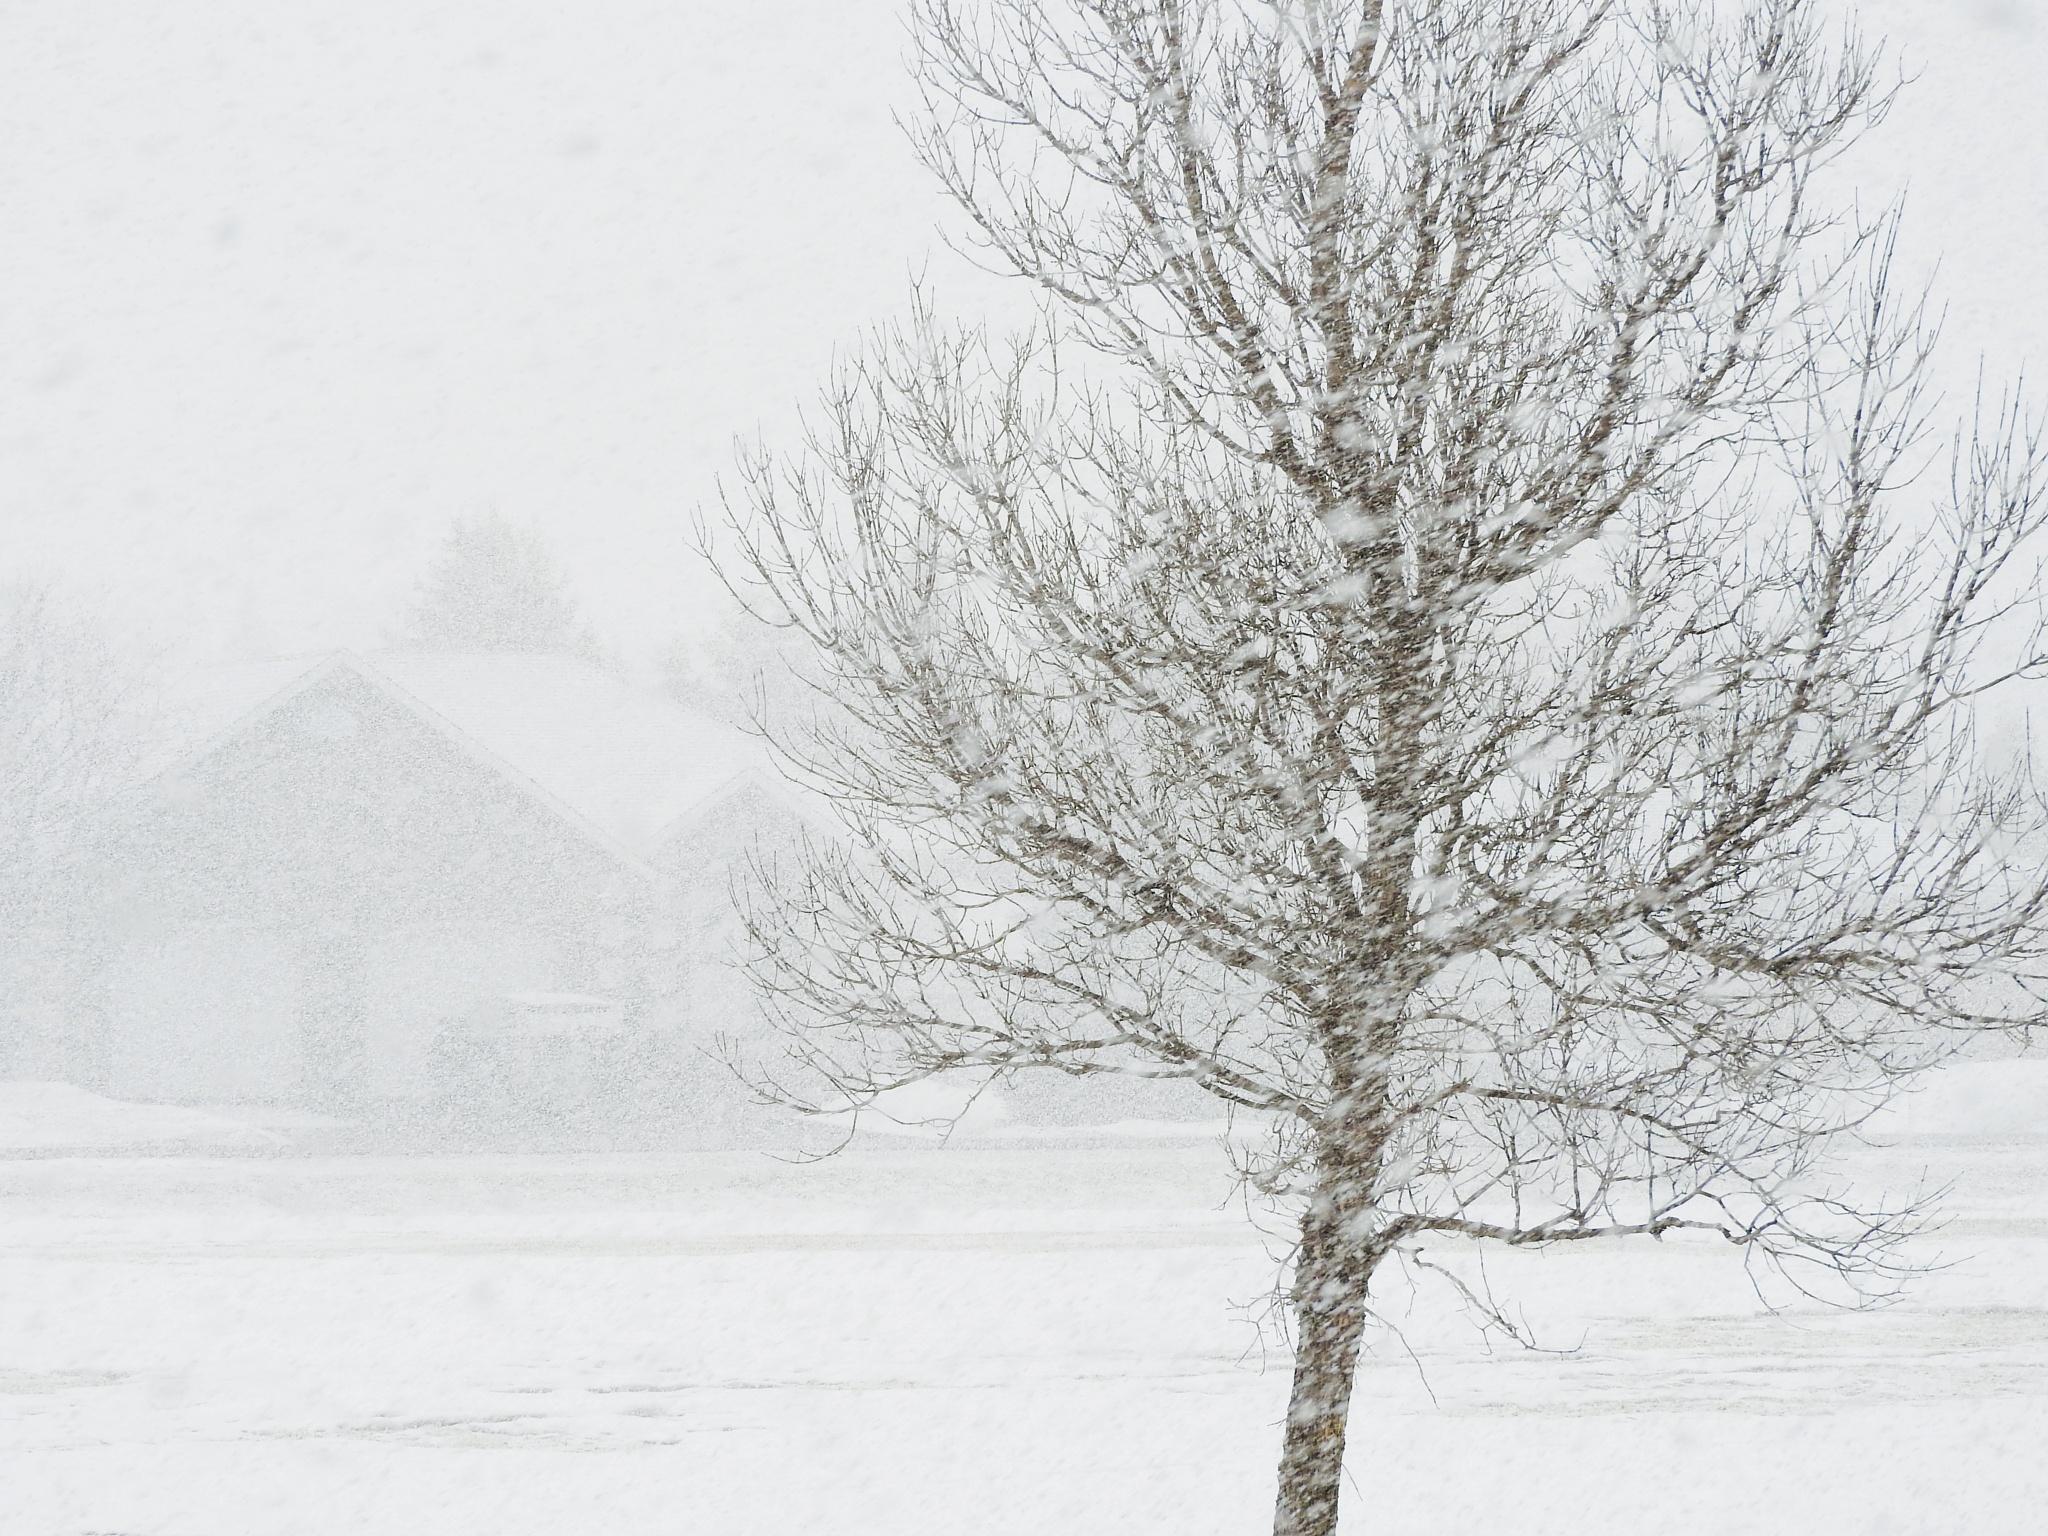 Spring snowstorm  by Lorraine Furmanic